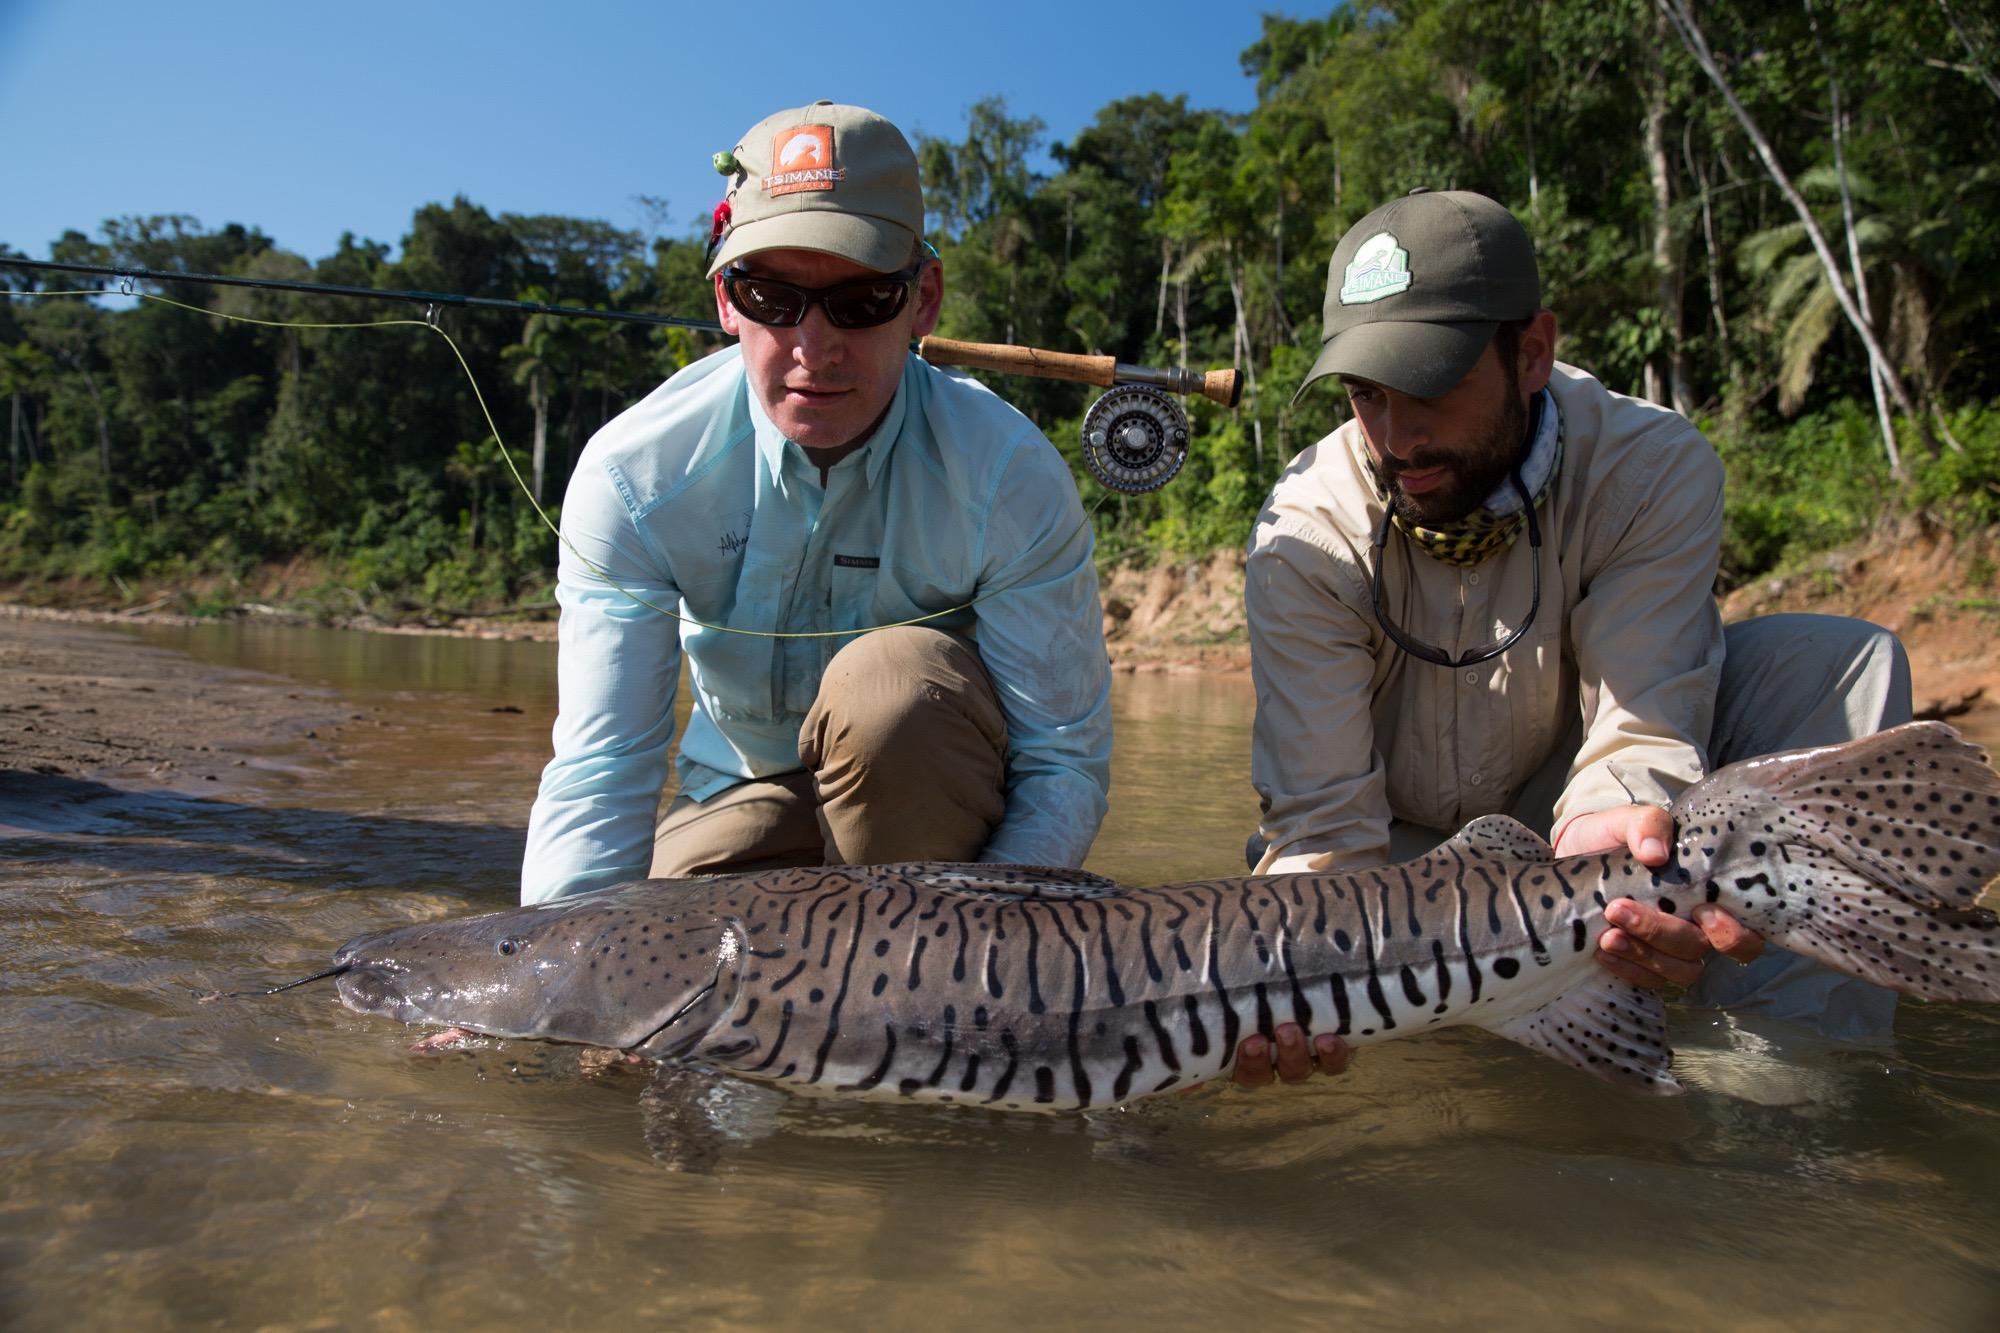 Tsimane, Fishing Bolivia, secure, agua negra, pluma, outcamps, untamed angling, fishing dorado bolivia, fishing pacu fly, No categories Tsimane Lodge